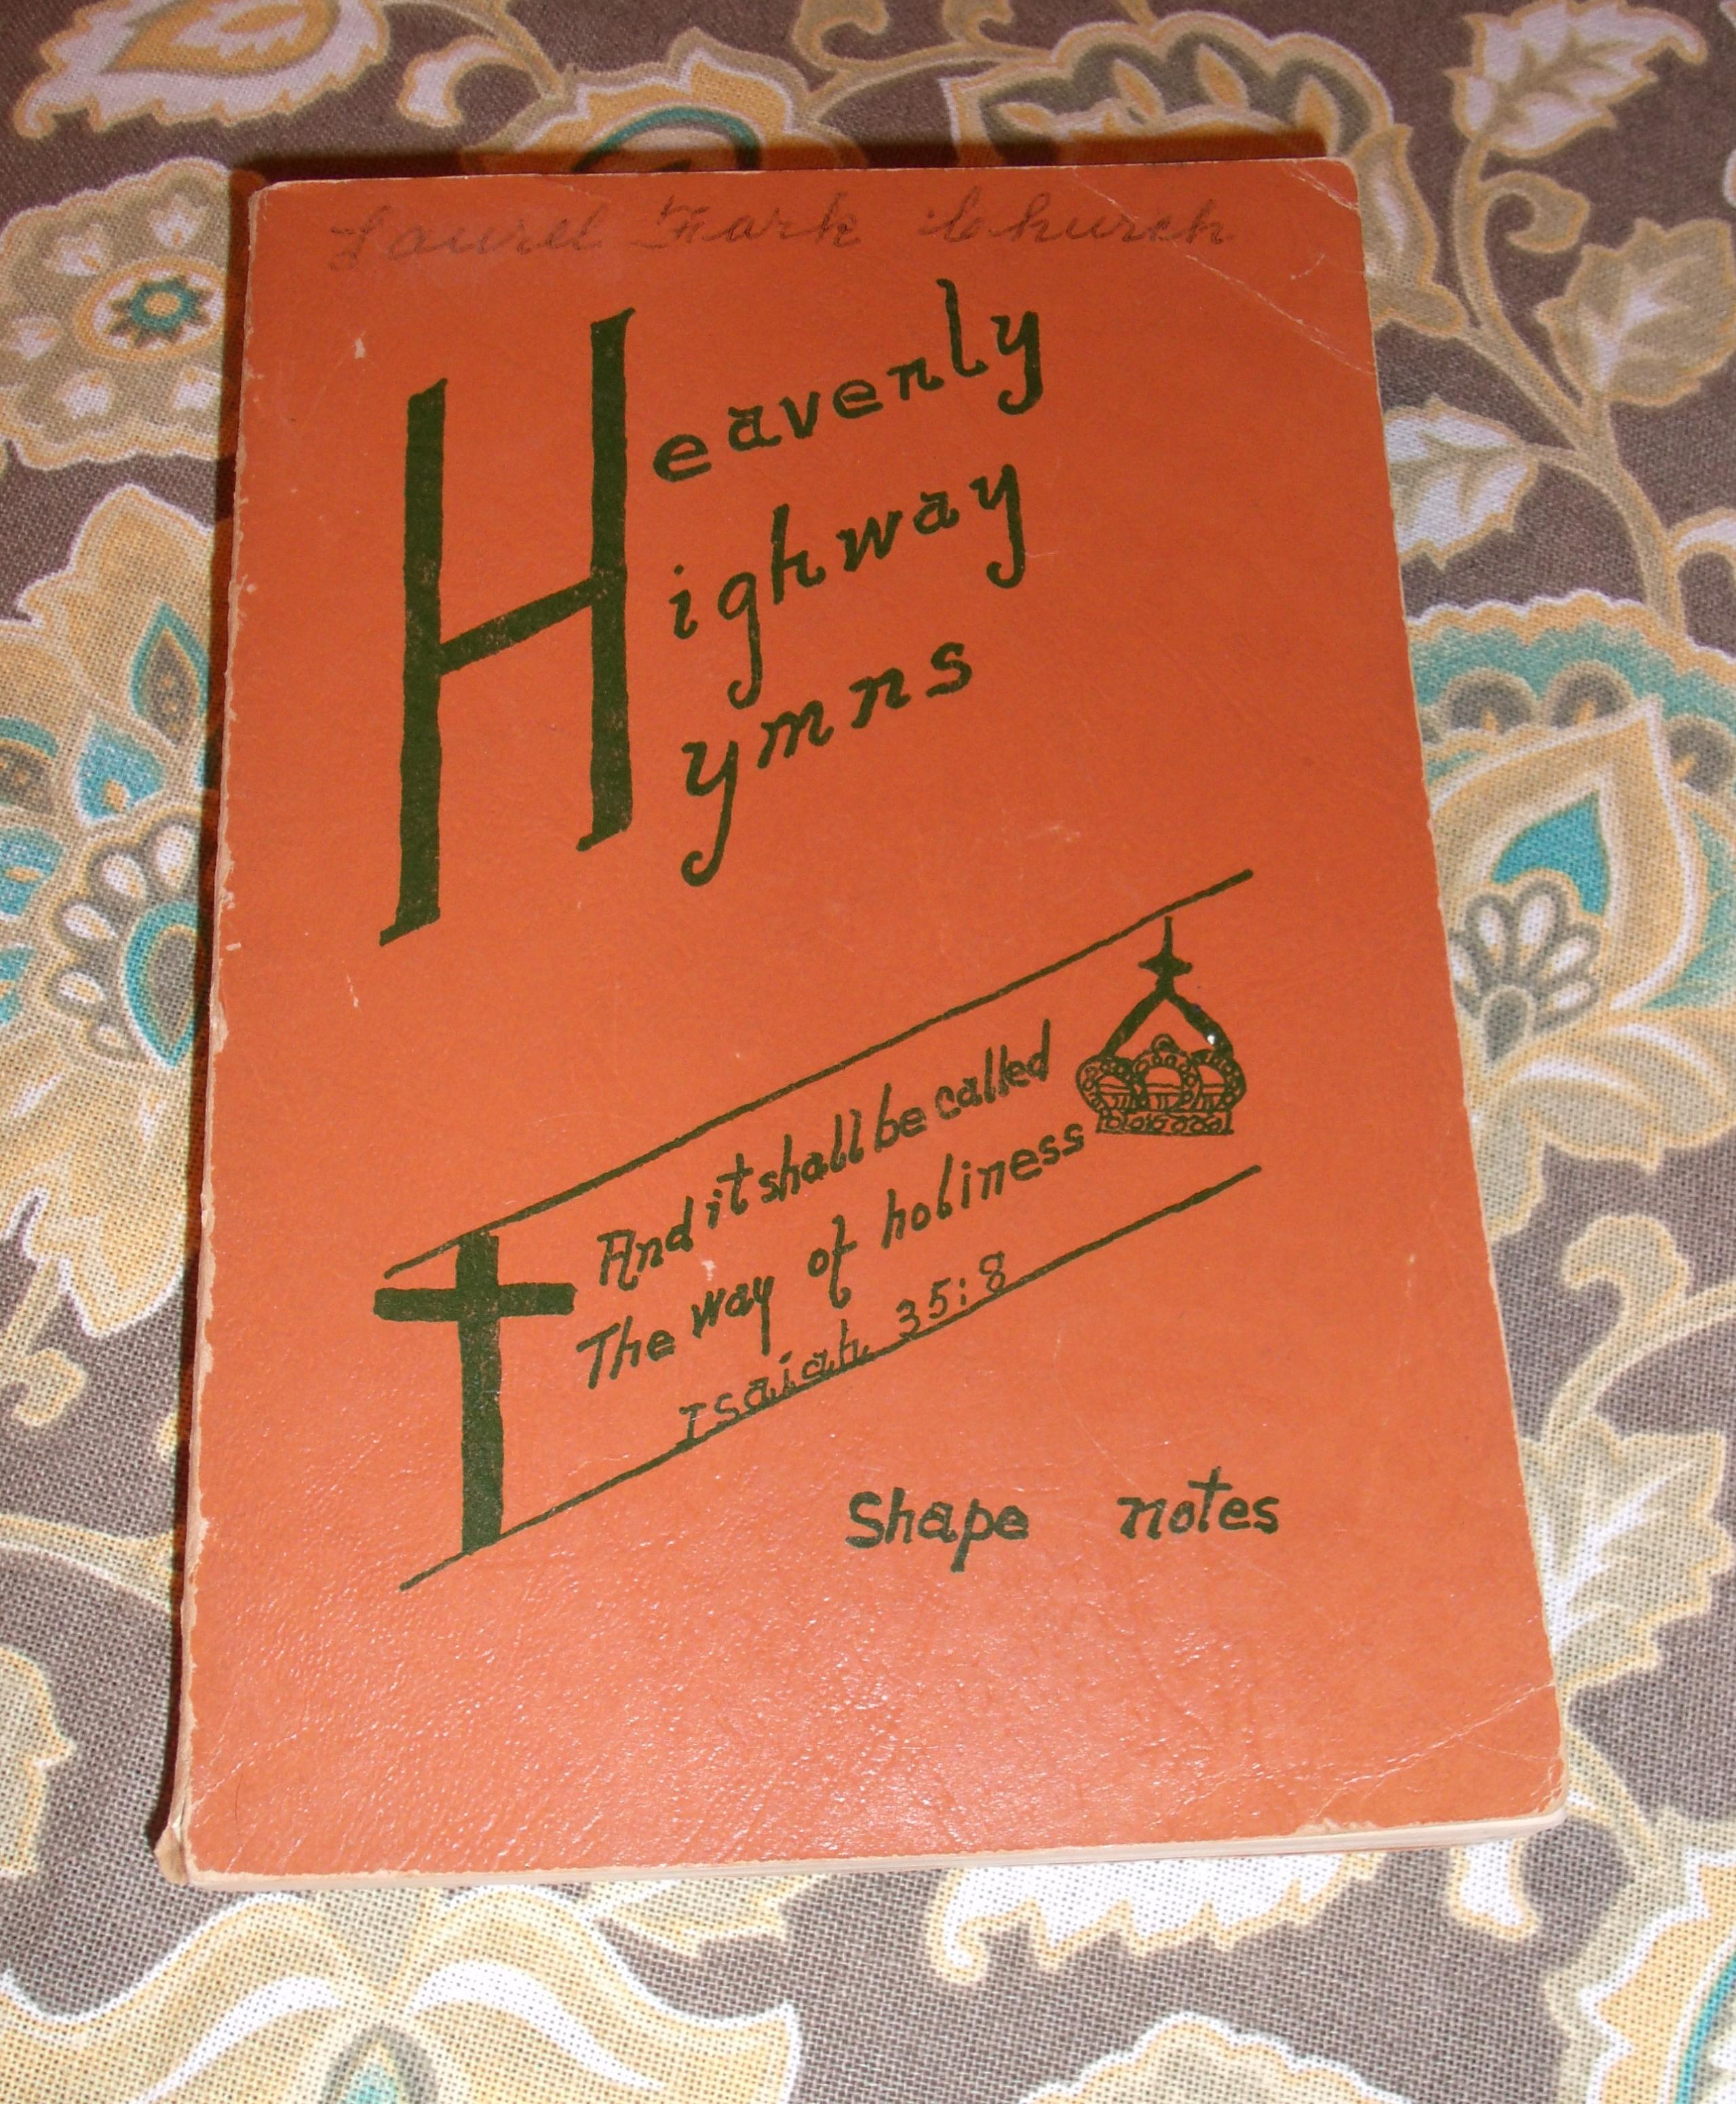 Hevenly Highway Hymns